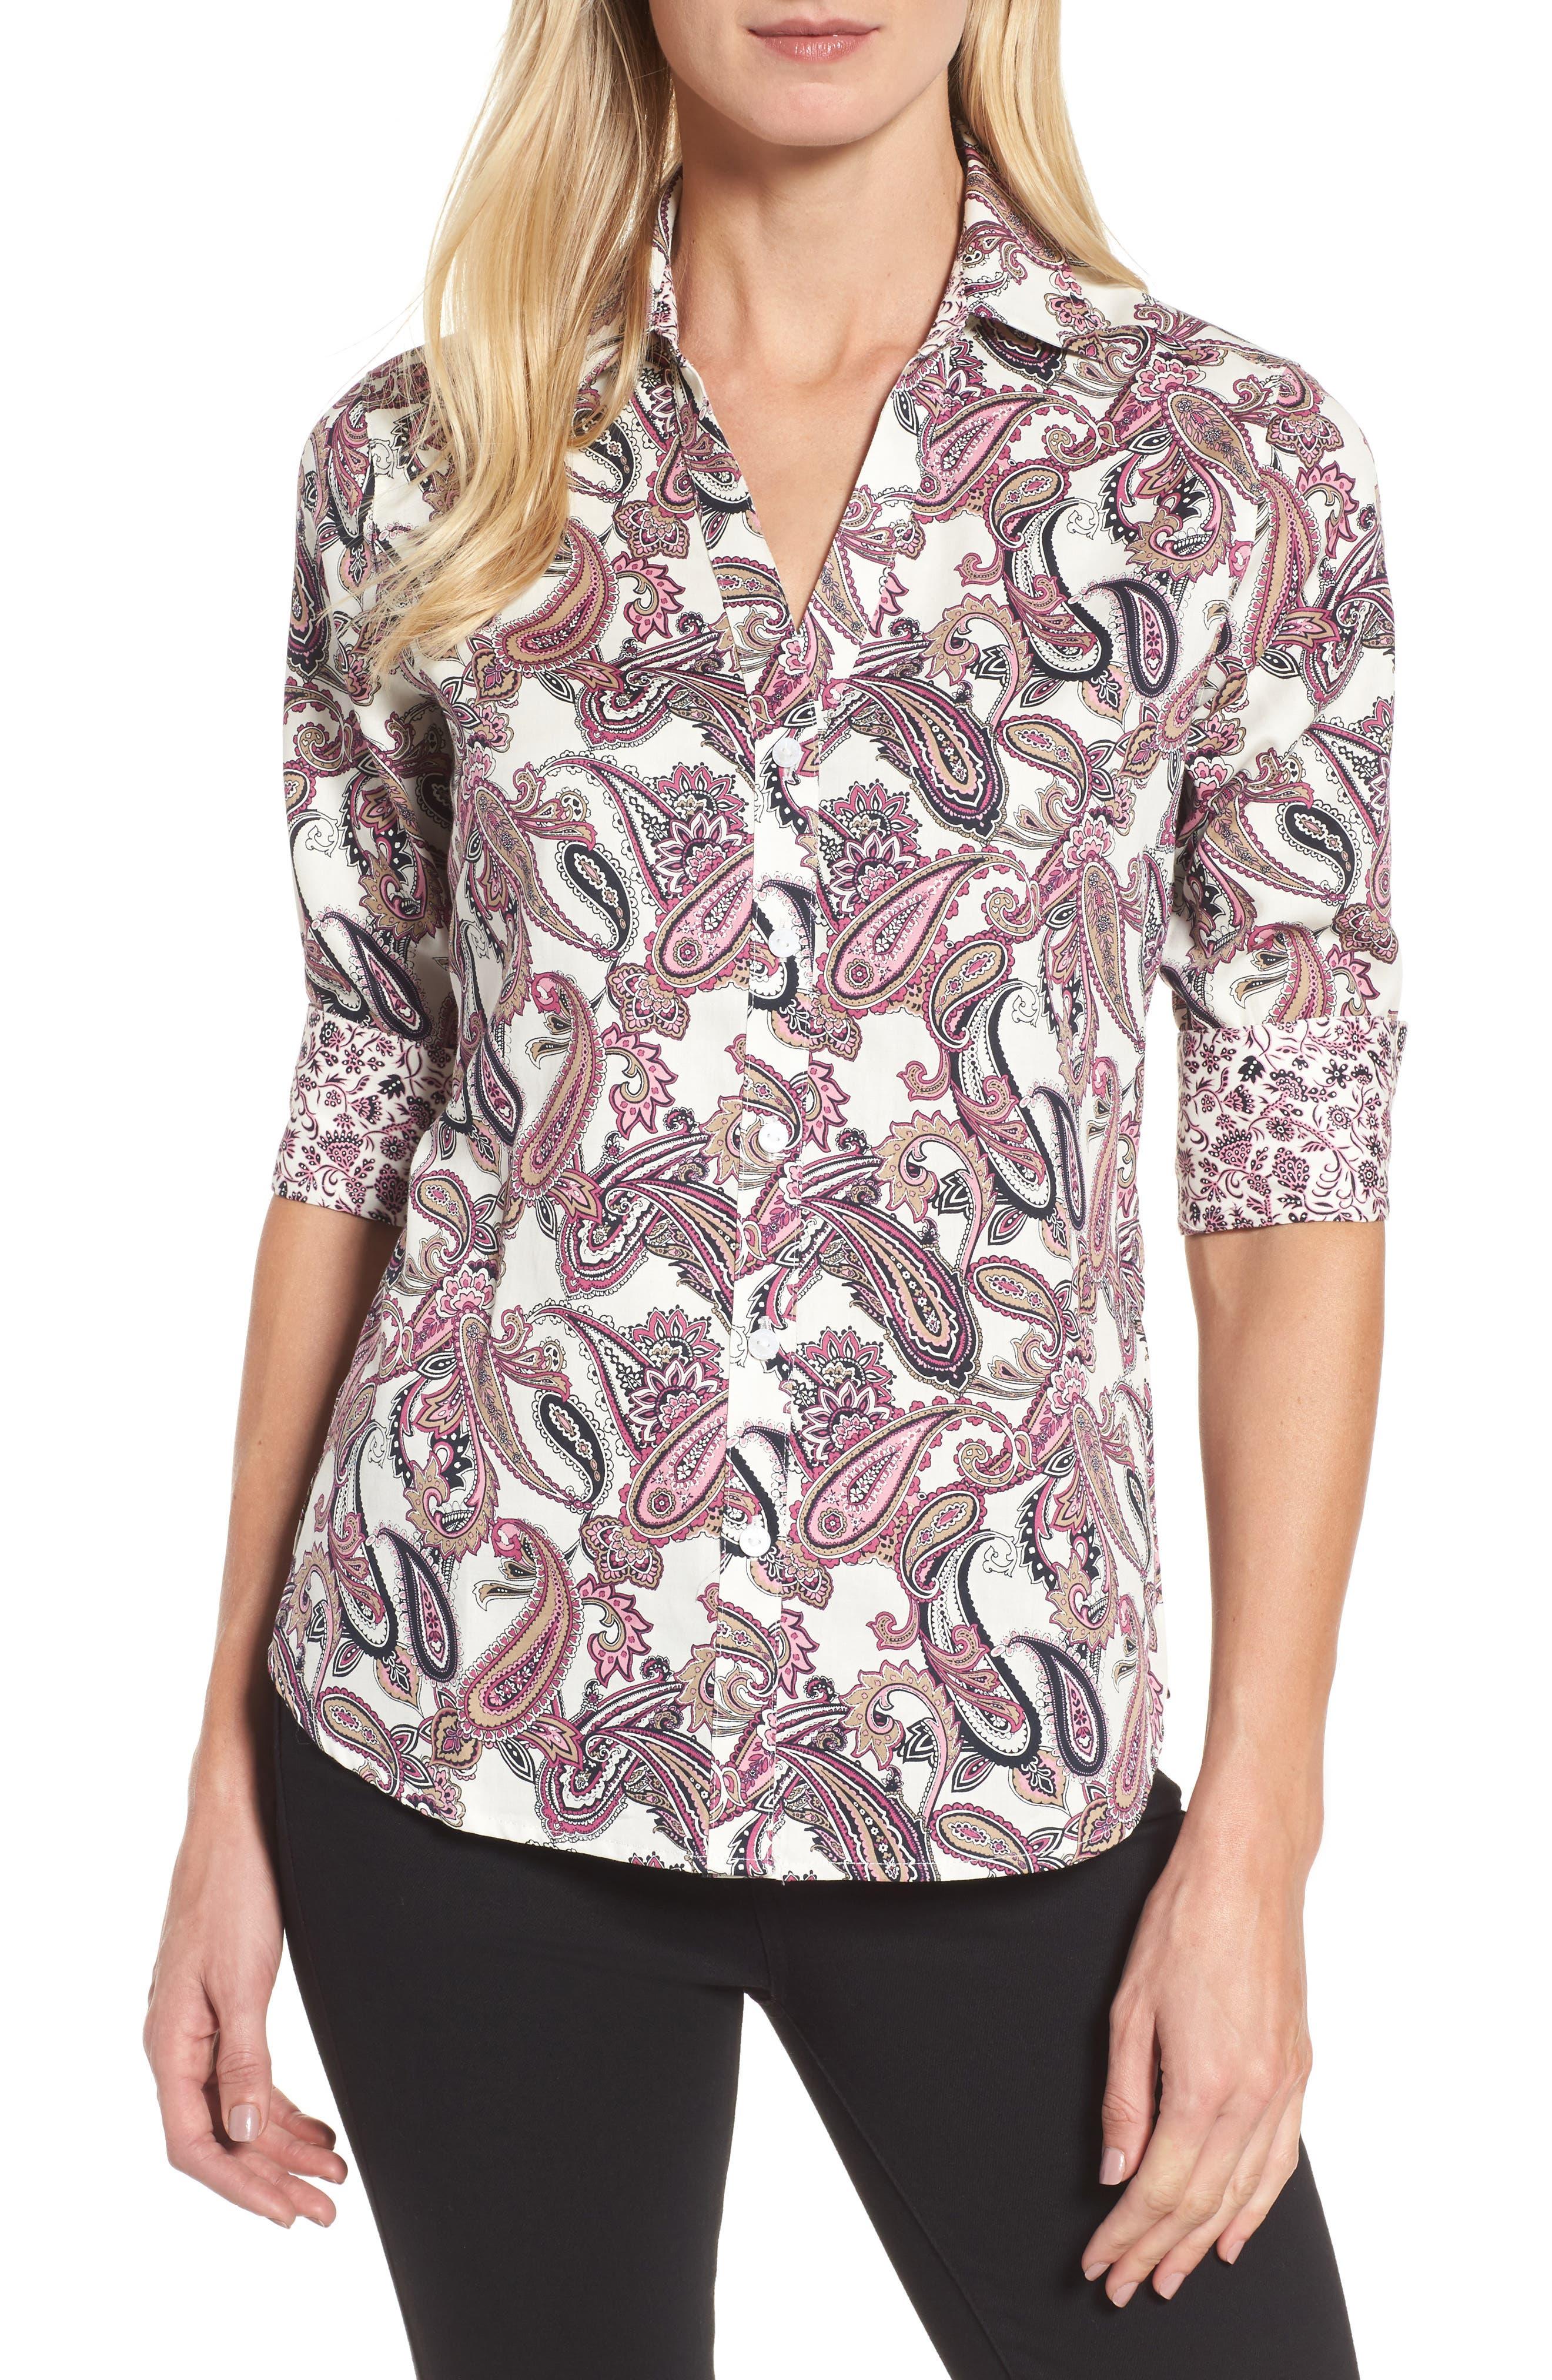 Mary Paisley Wrinkle Free Shirt,                             Main thumbnail 1, color,                             935